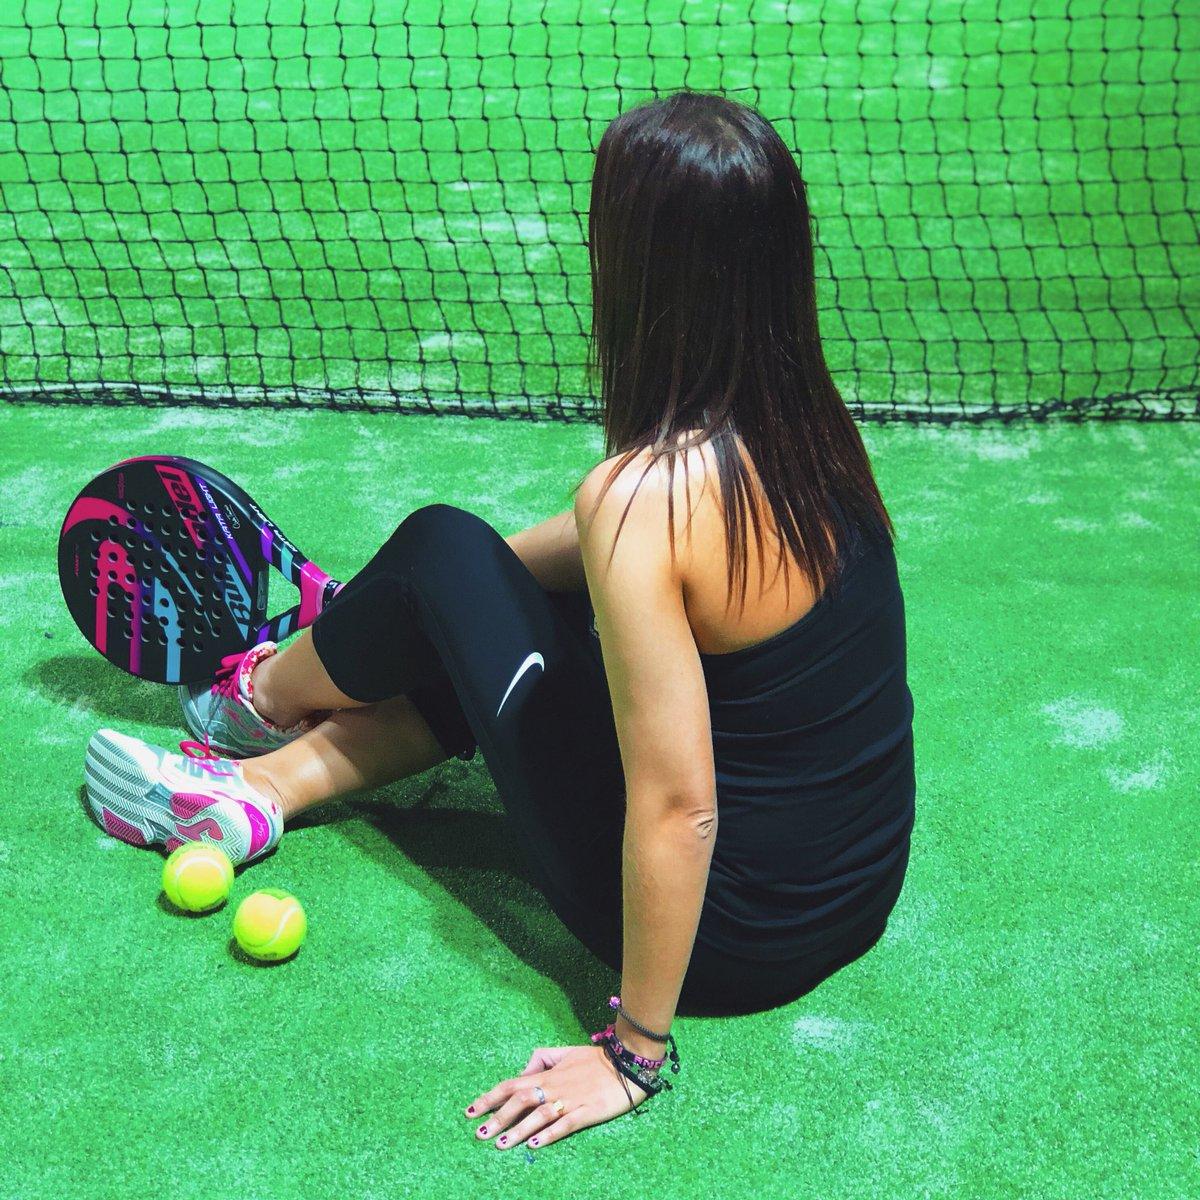 #padel #padelfun #padelindoor #padelclub #ilovepadel #bullpadel #sport #padelmania #padelfemenino #padeladdict #padeltime #padelgirls pic.twitter.com/UiKsr4v9B8